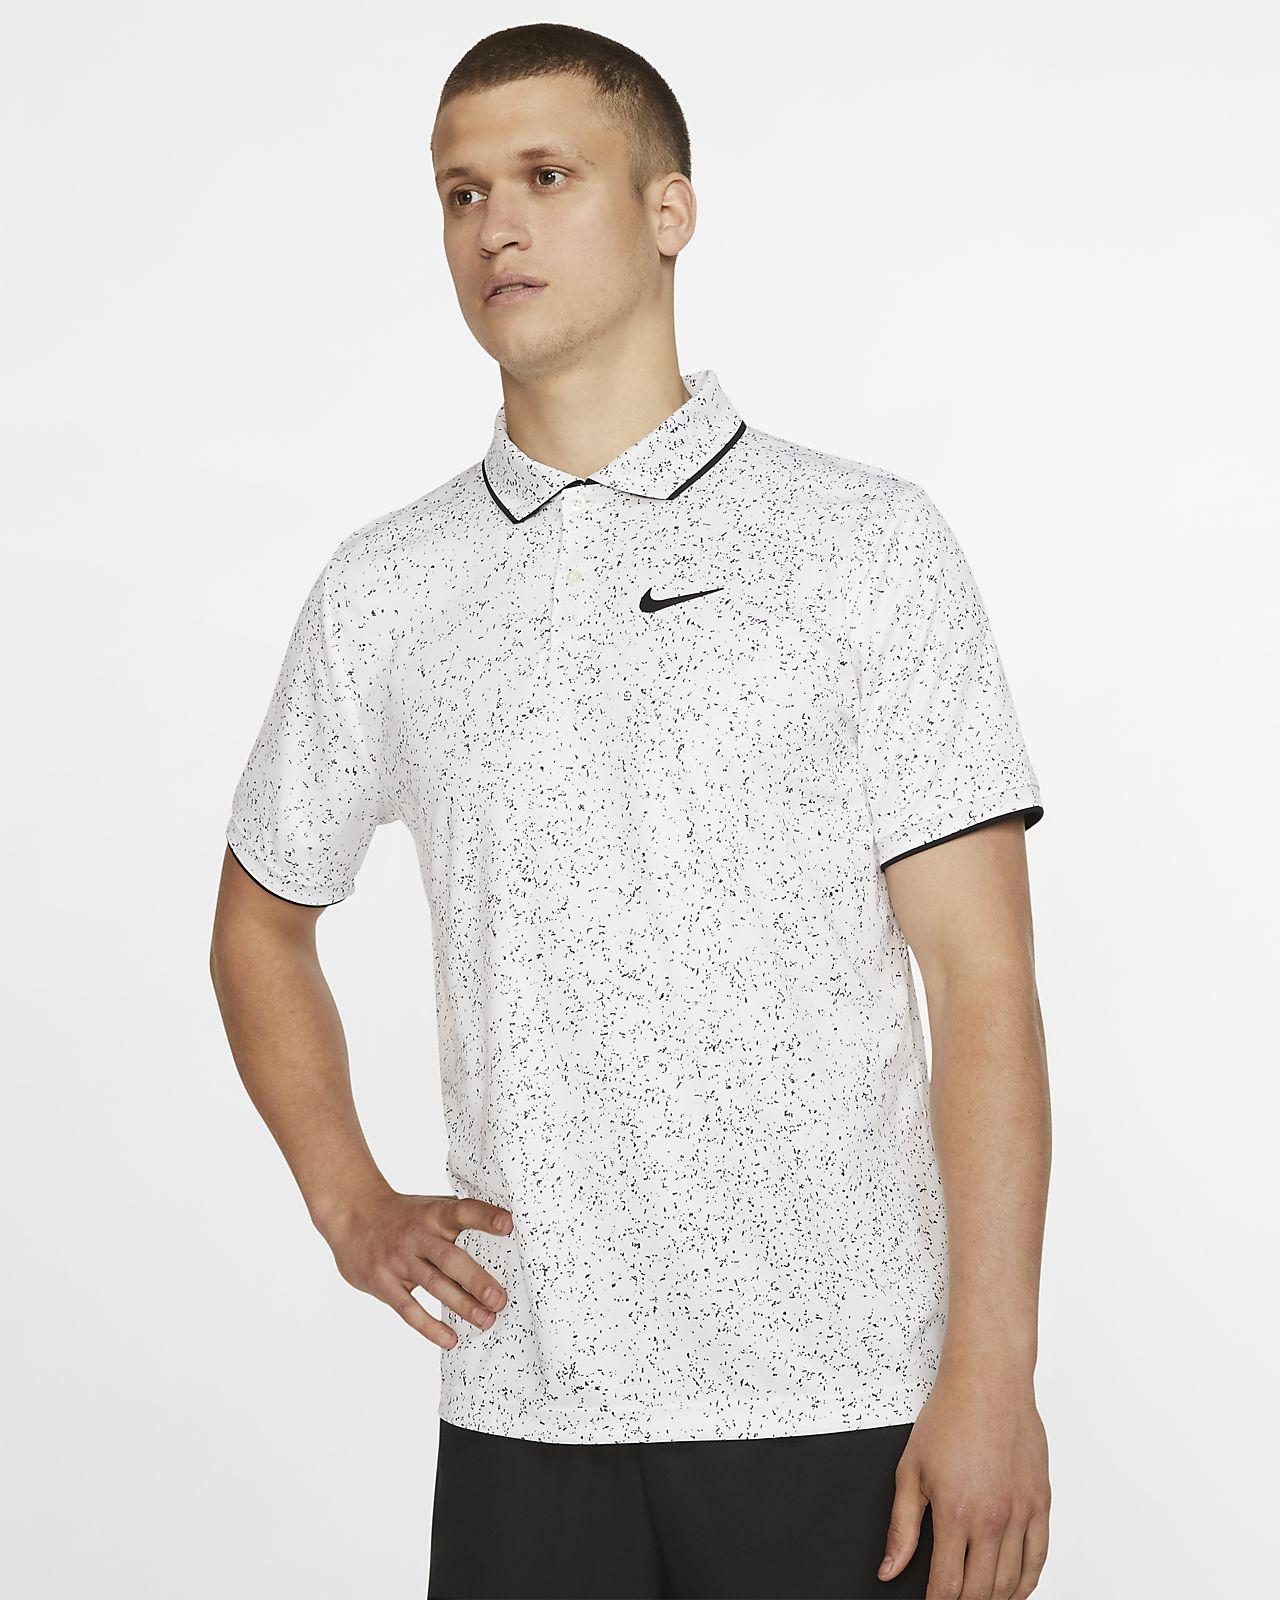 Mönstrad tennispikétröja NikeCourt Dri-FIT för män